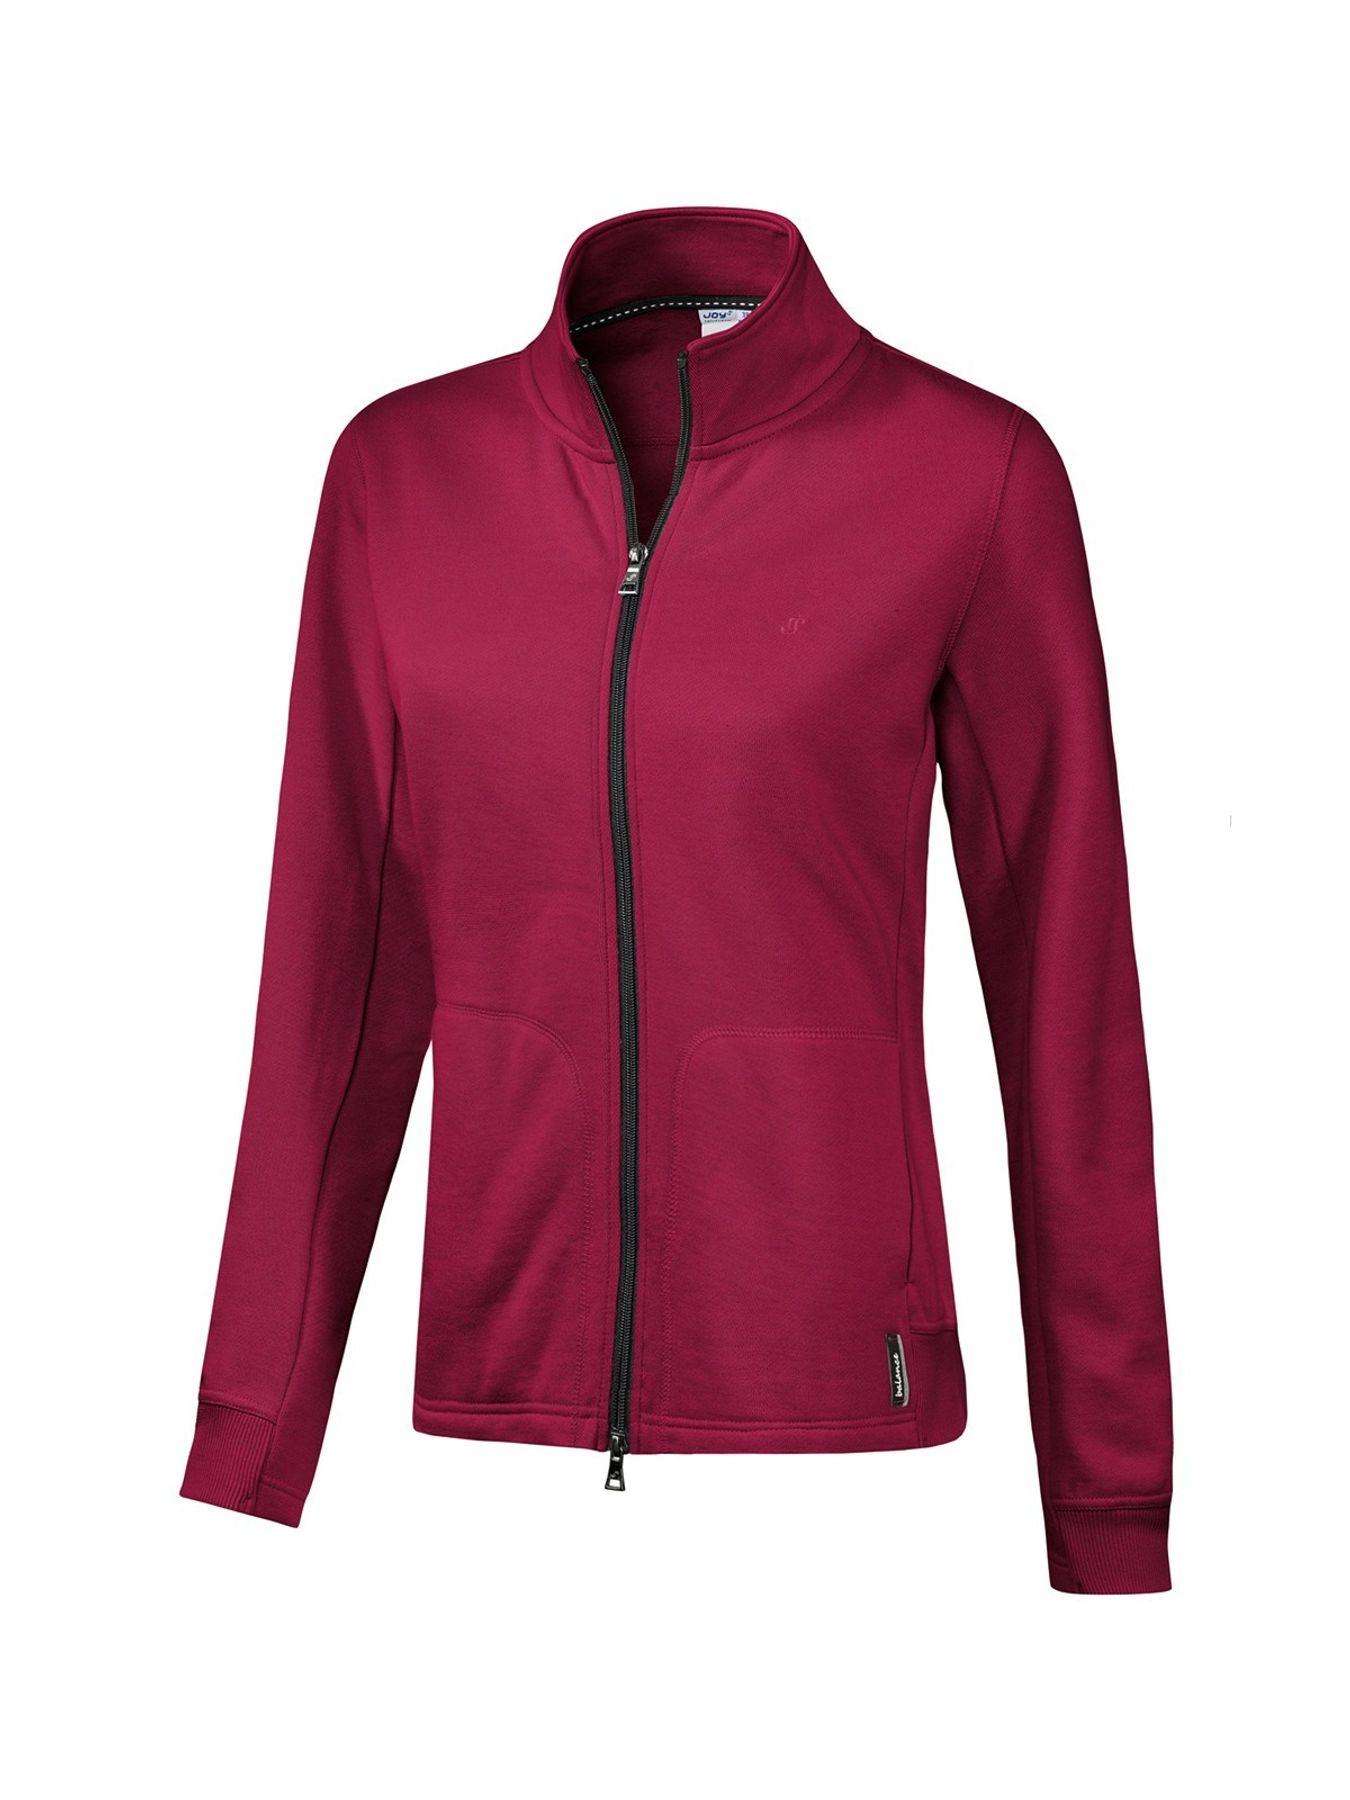 Joy - Damen Sport und Freizeit Jacke in mehreren Farben, Paulina (34500) – Bild 13